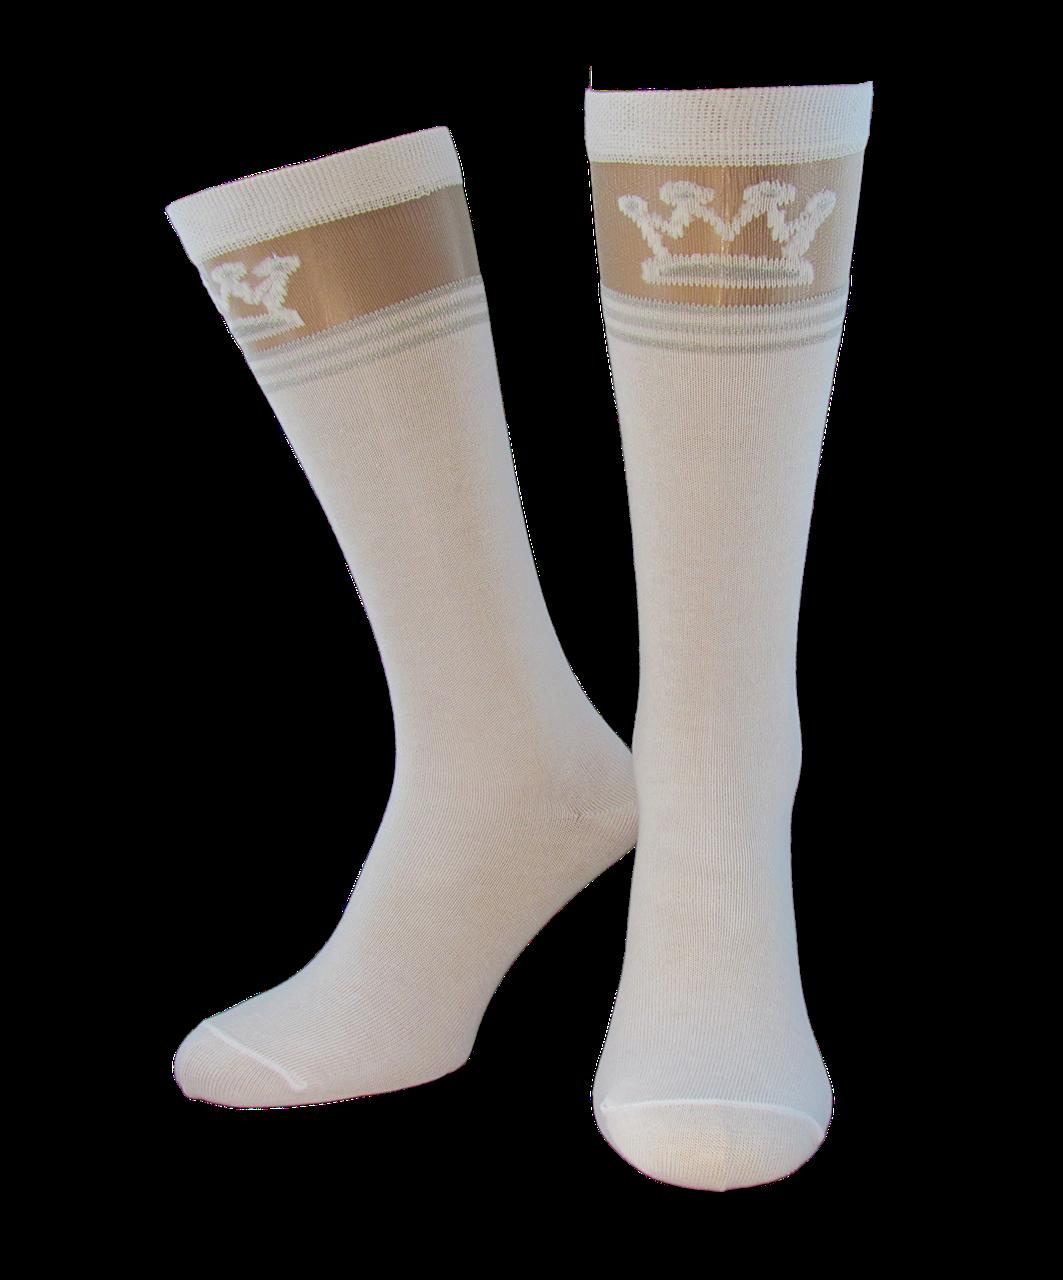 Носки гольфы детские Джулия KG1 CRISTAL LUREX 001 white